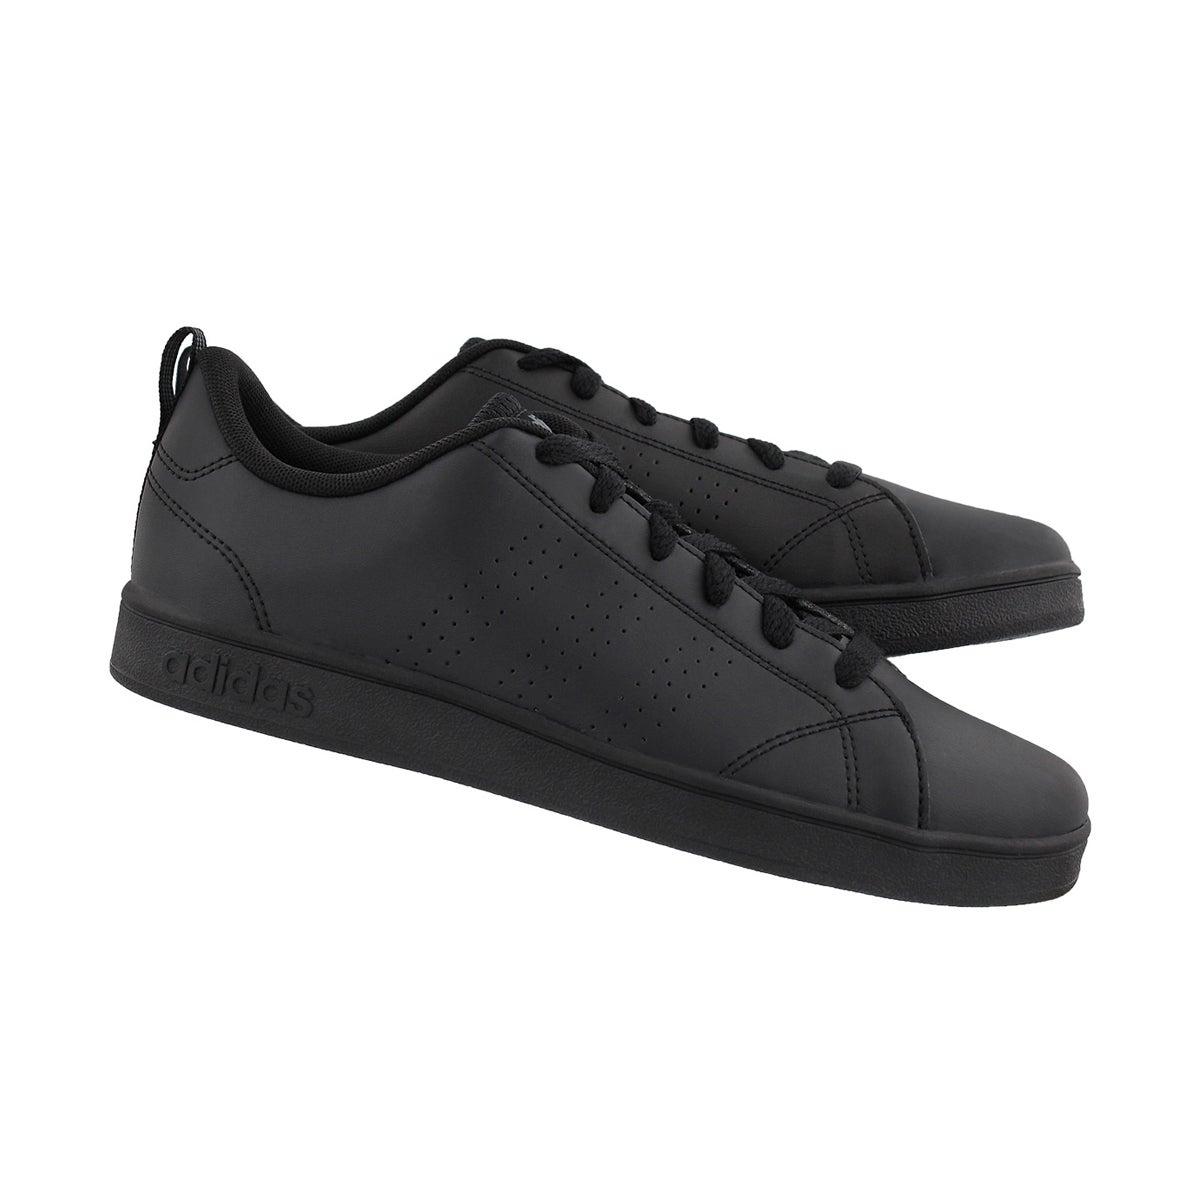 Chlds Advantage Clean black sneaker